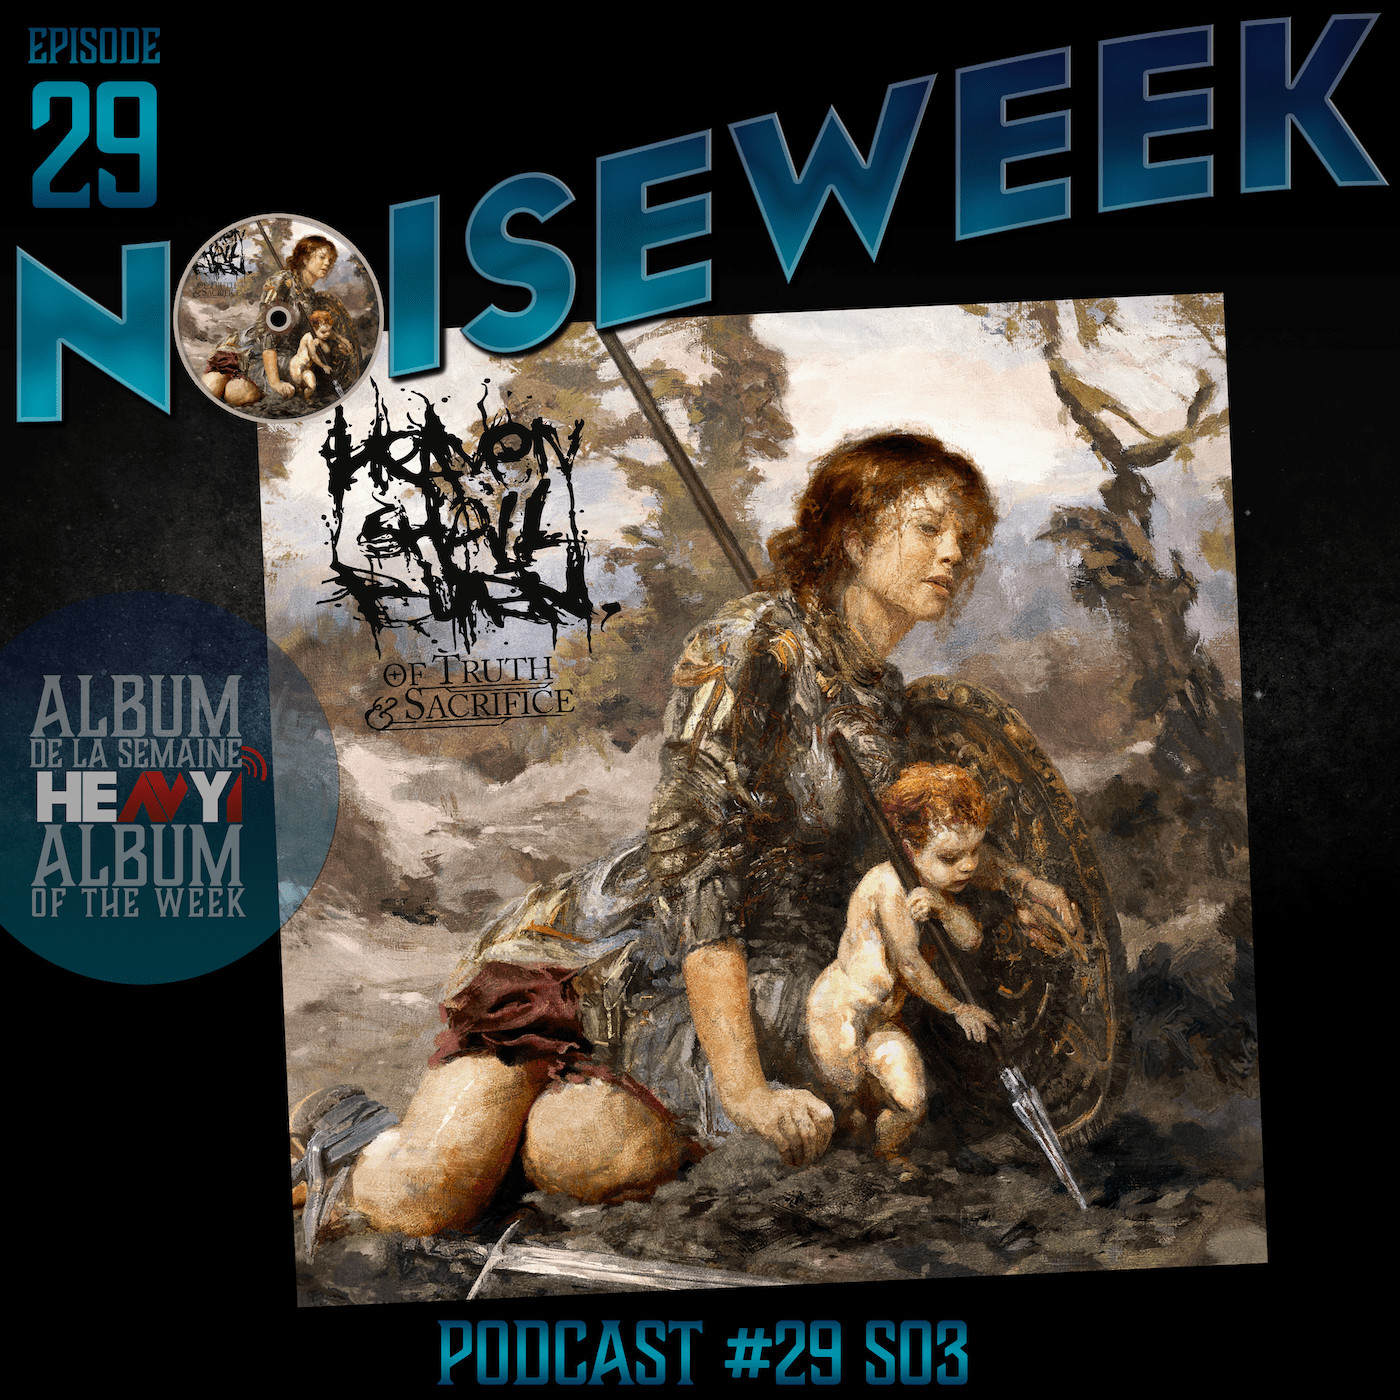 Noiseweek #29 Saison 3